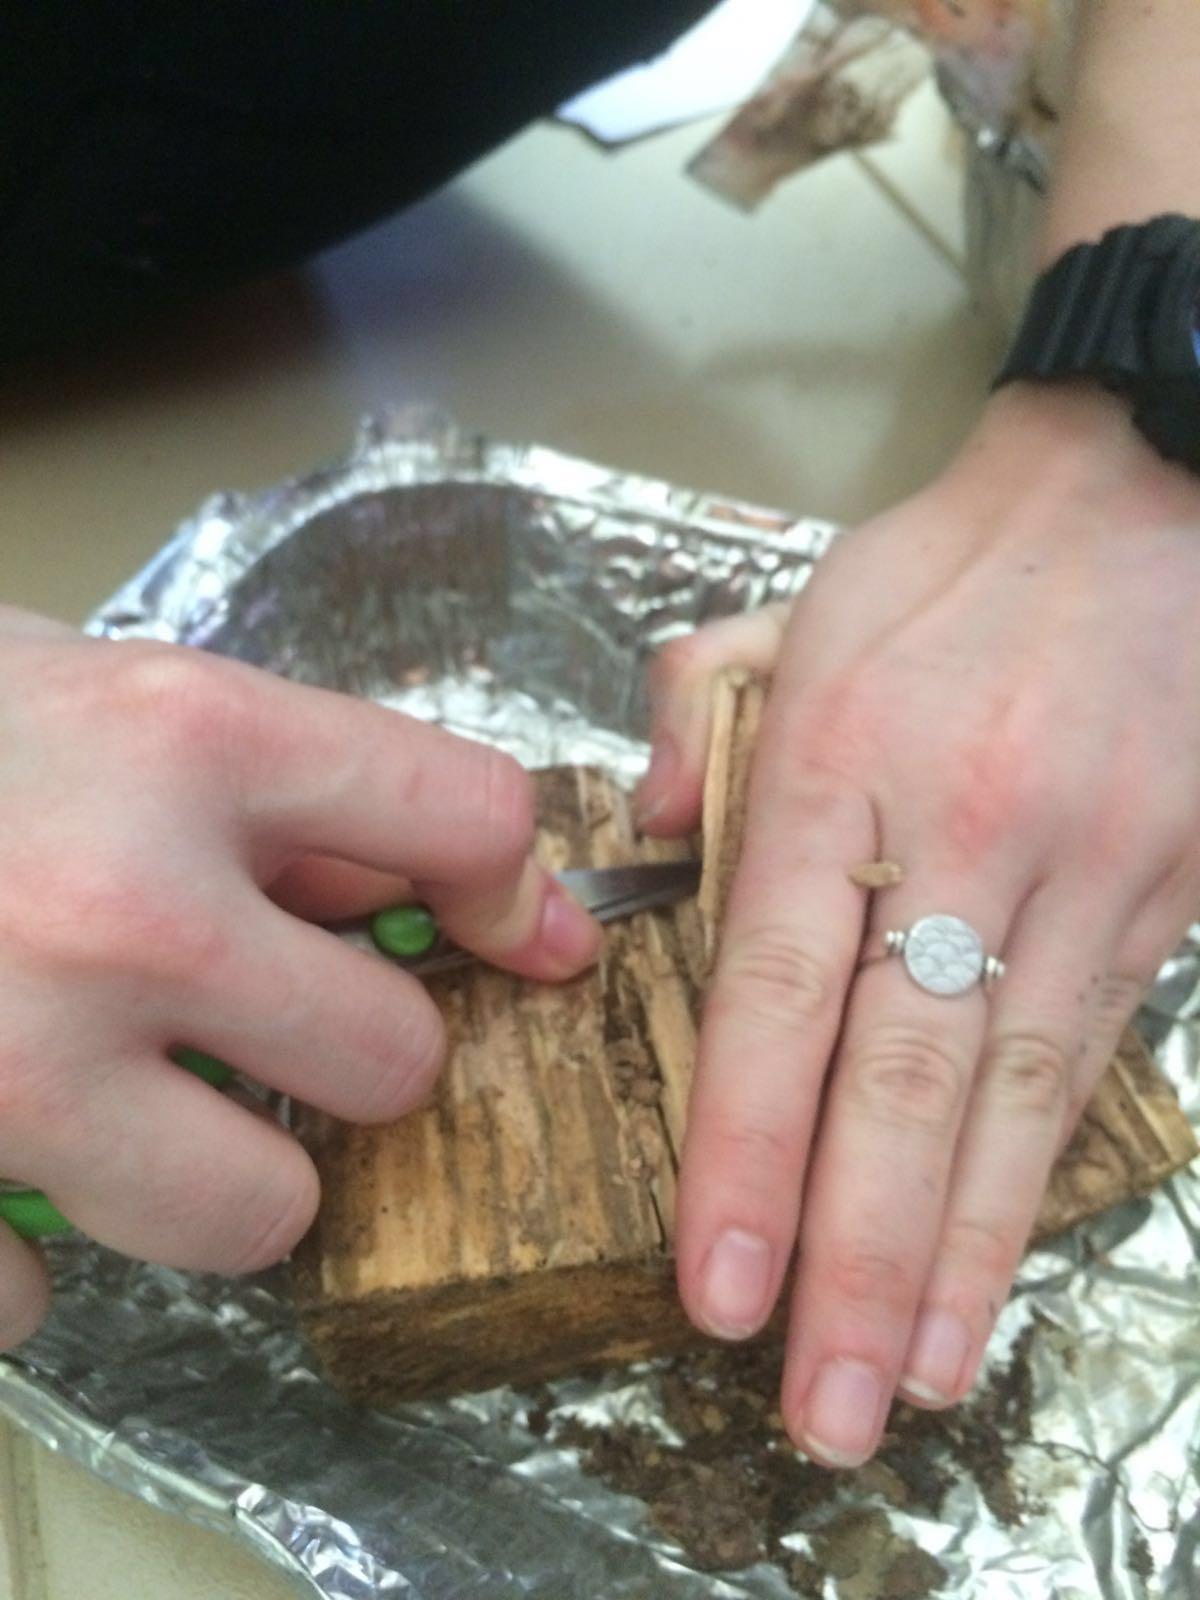 Cracking open a wood block